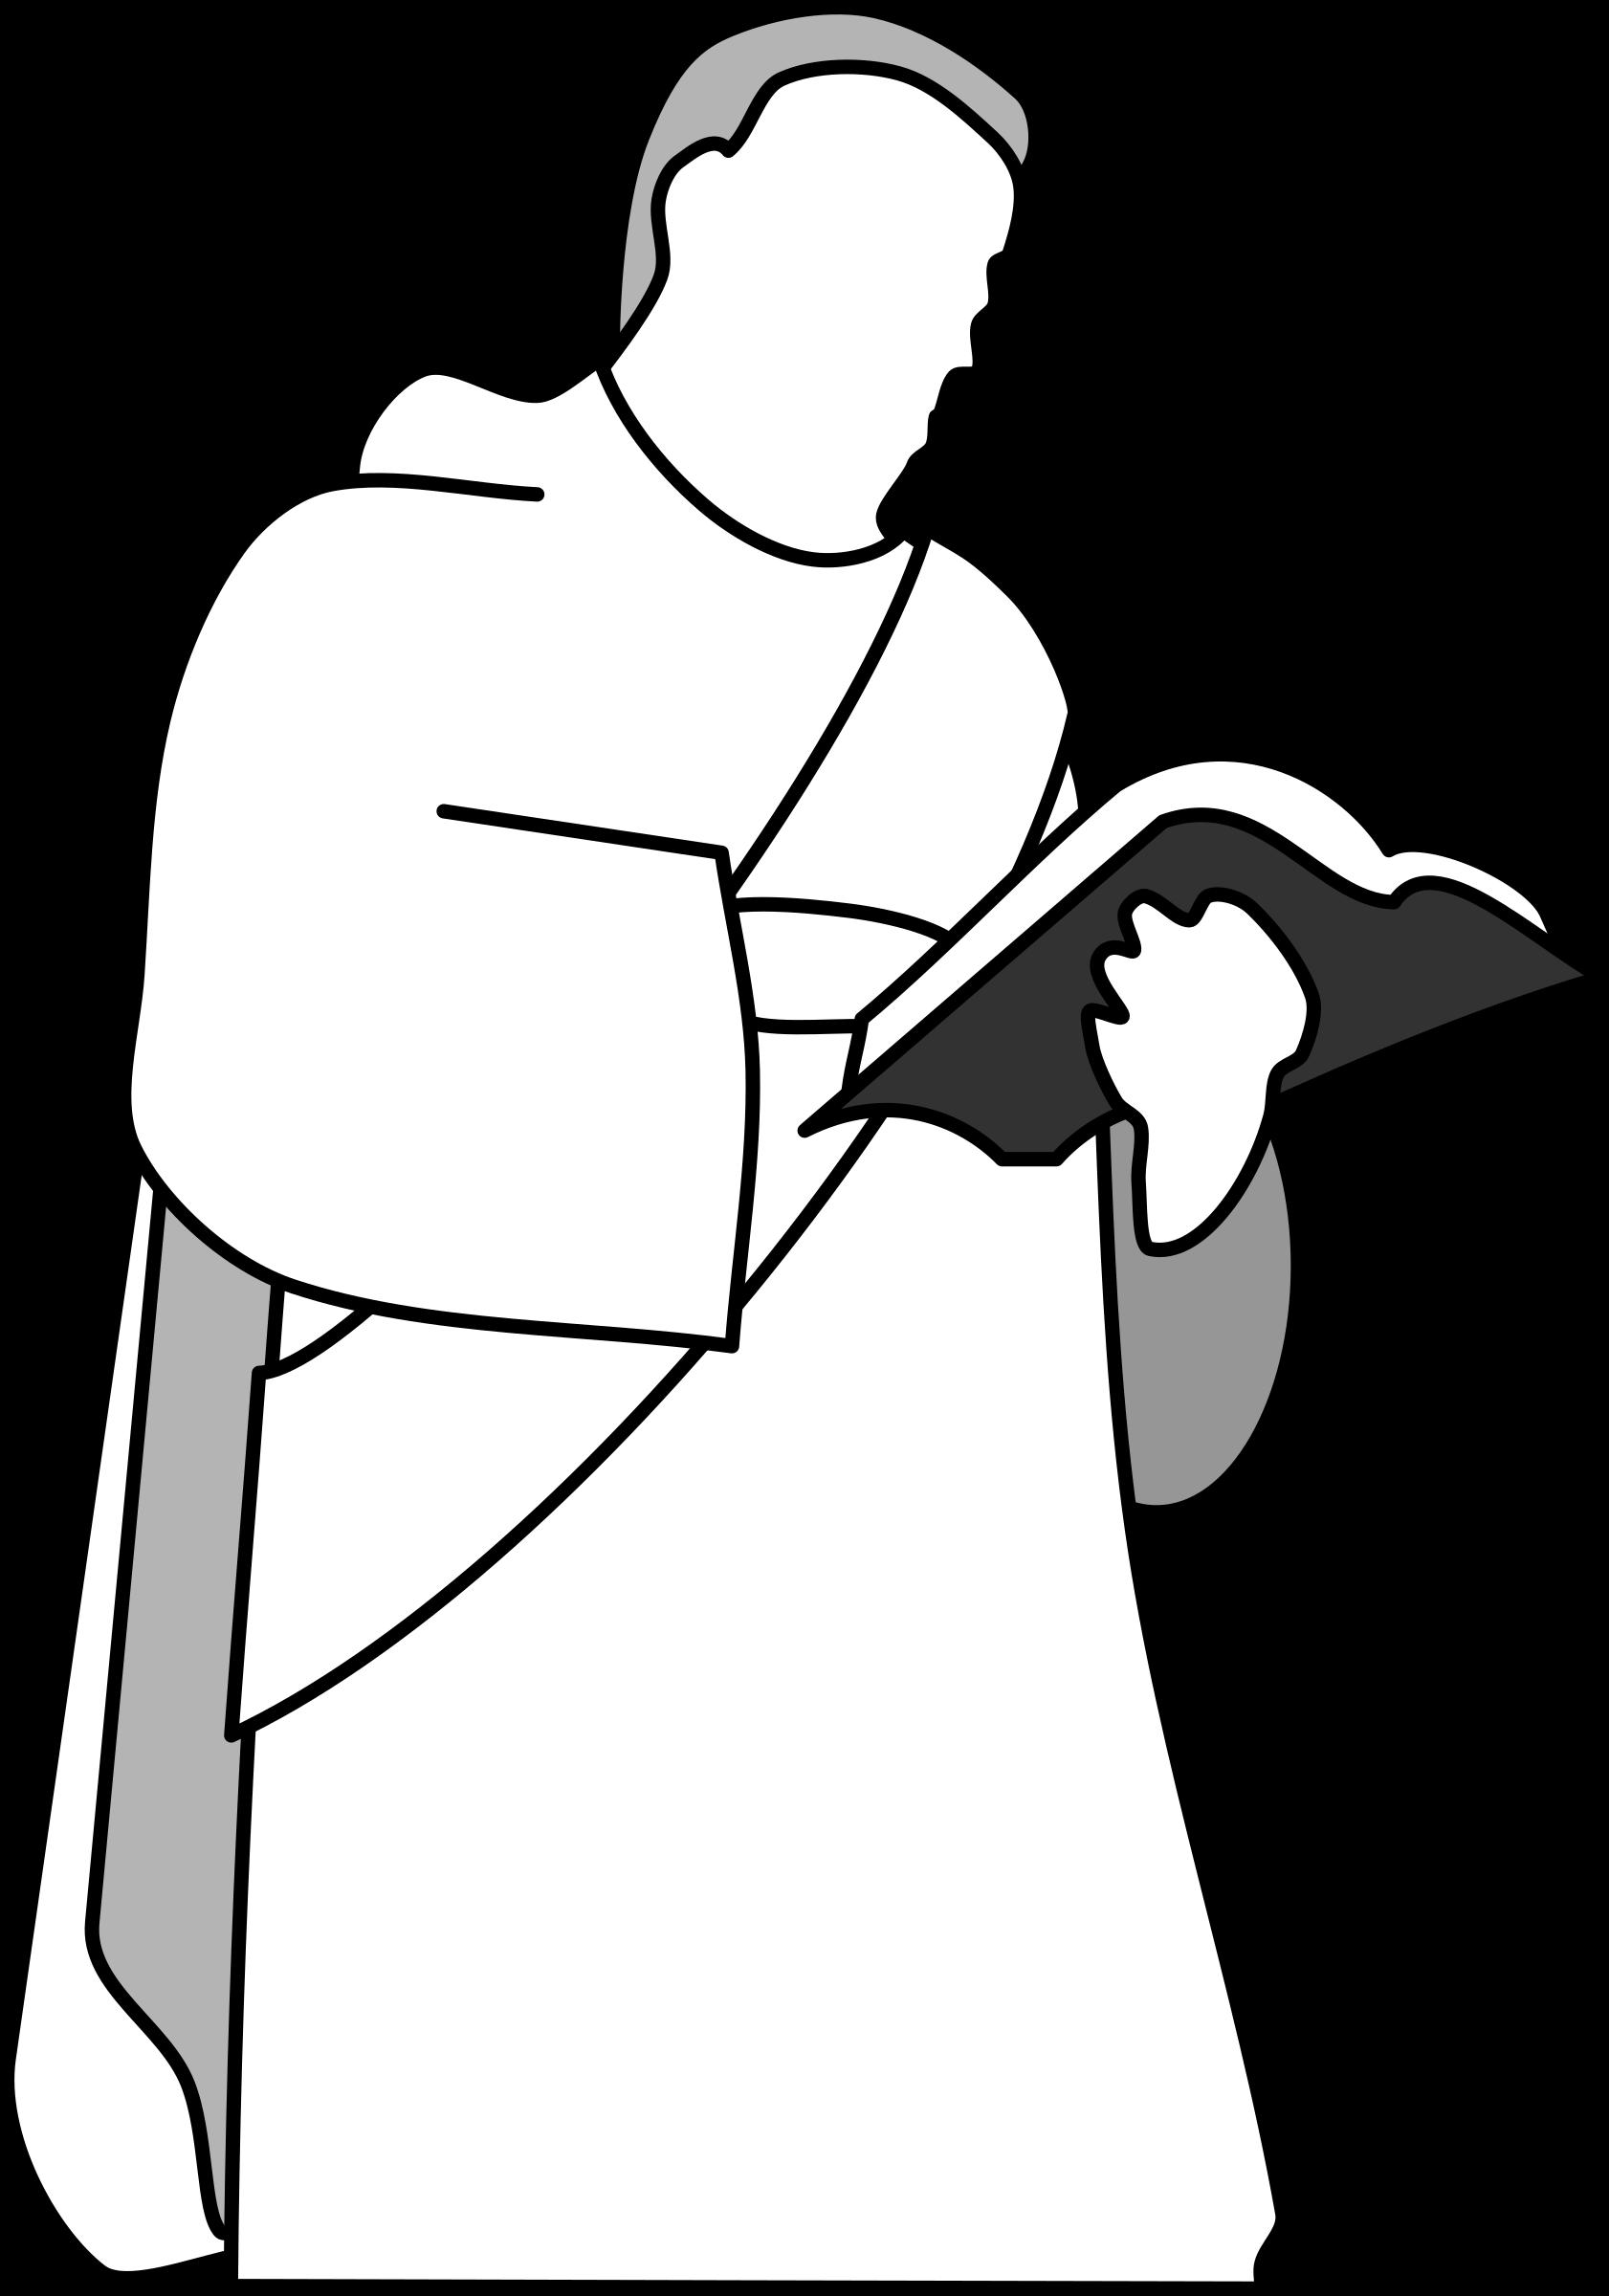 Deacon big image png. Clipart church person